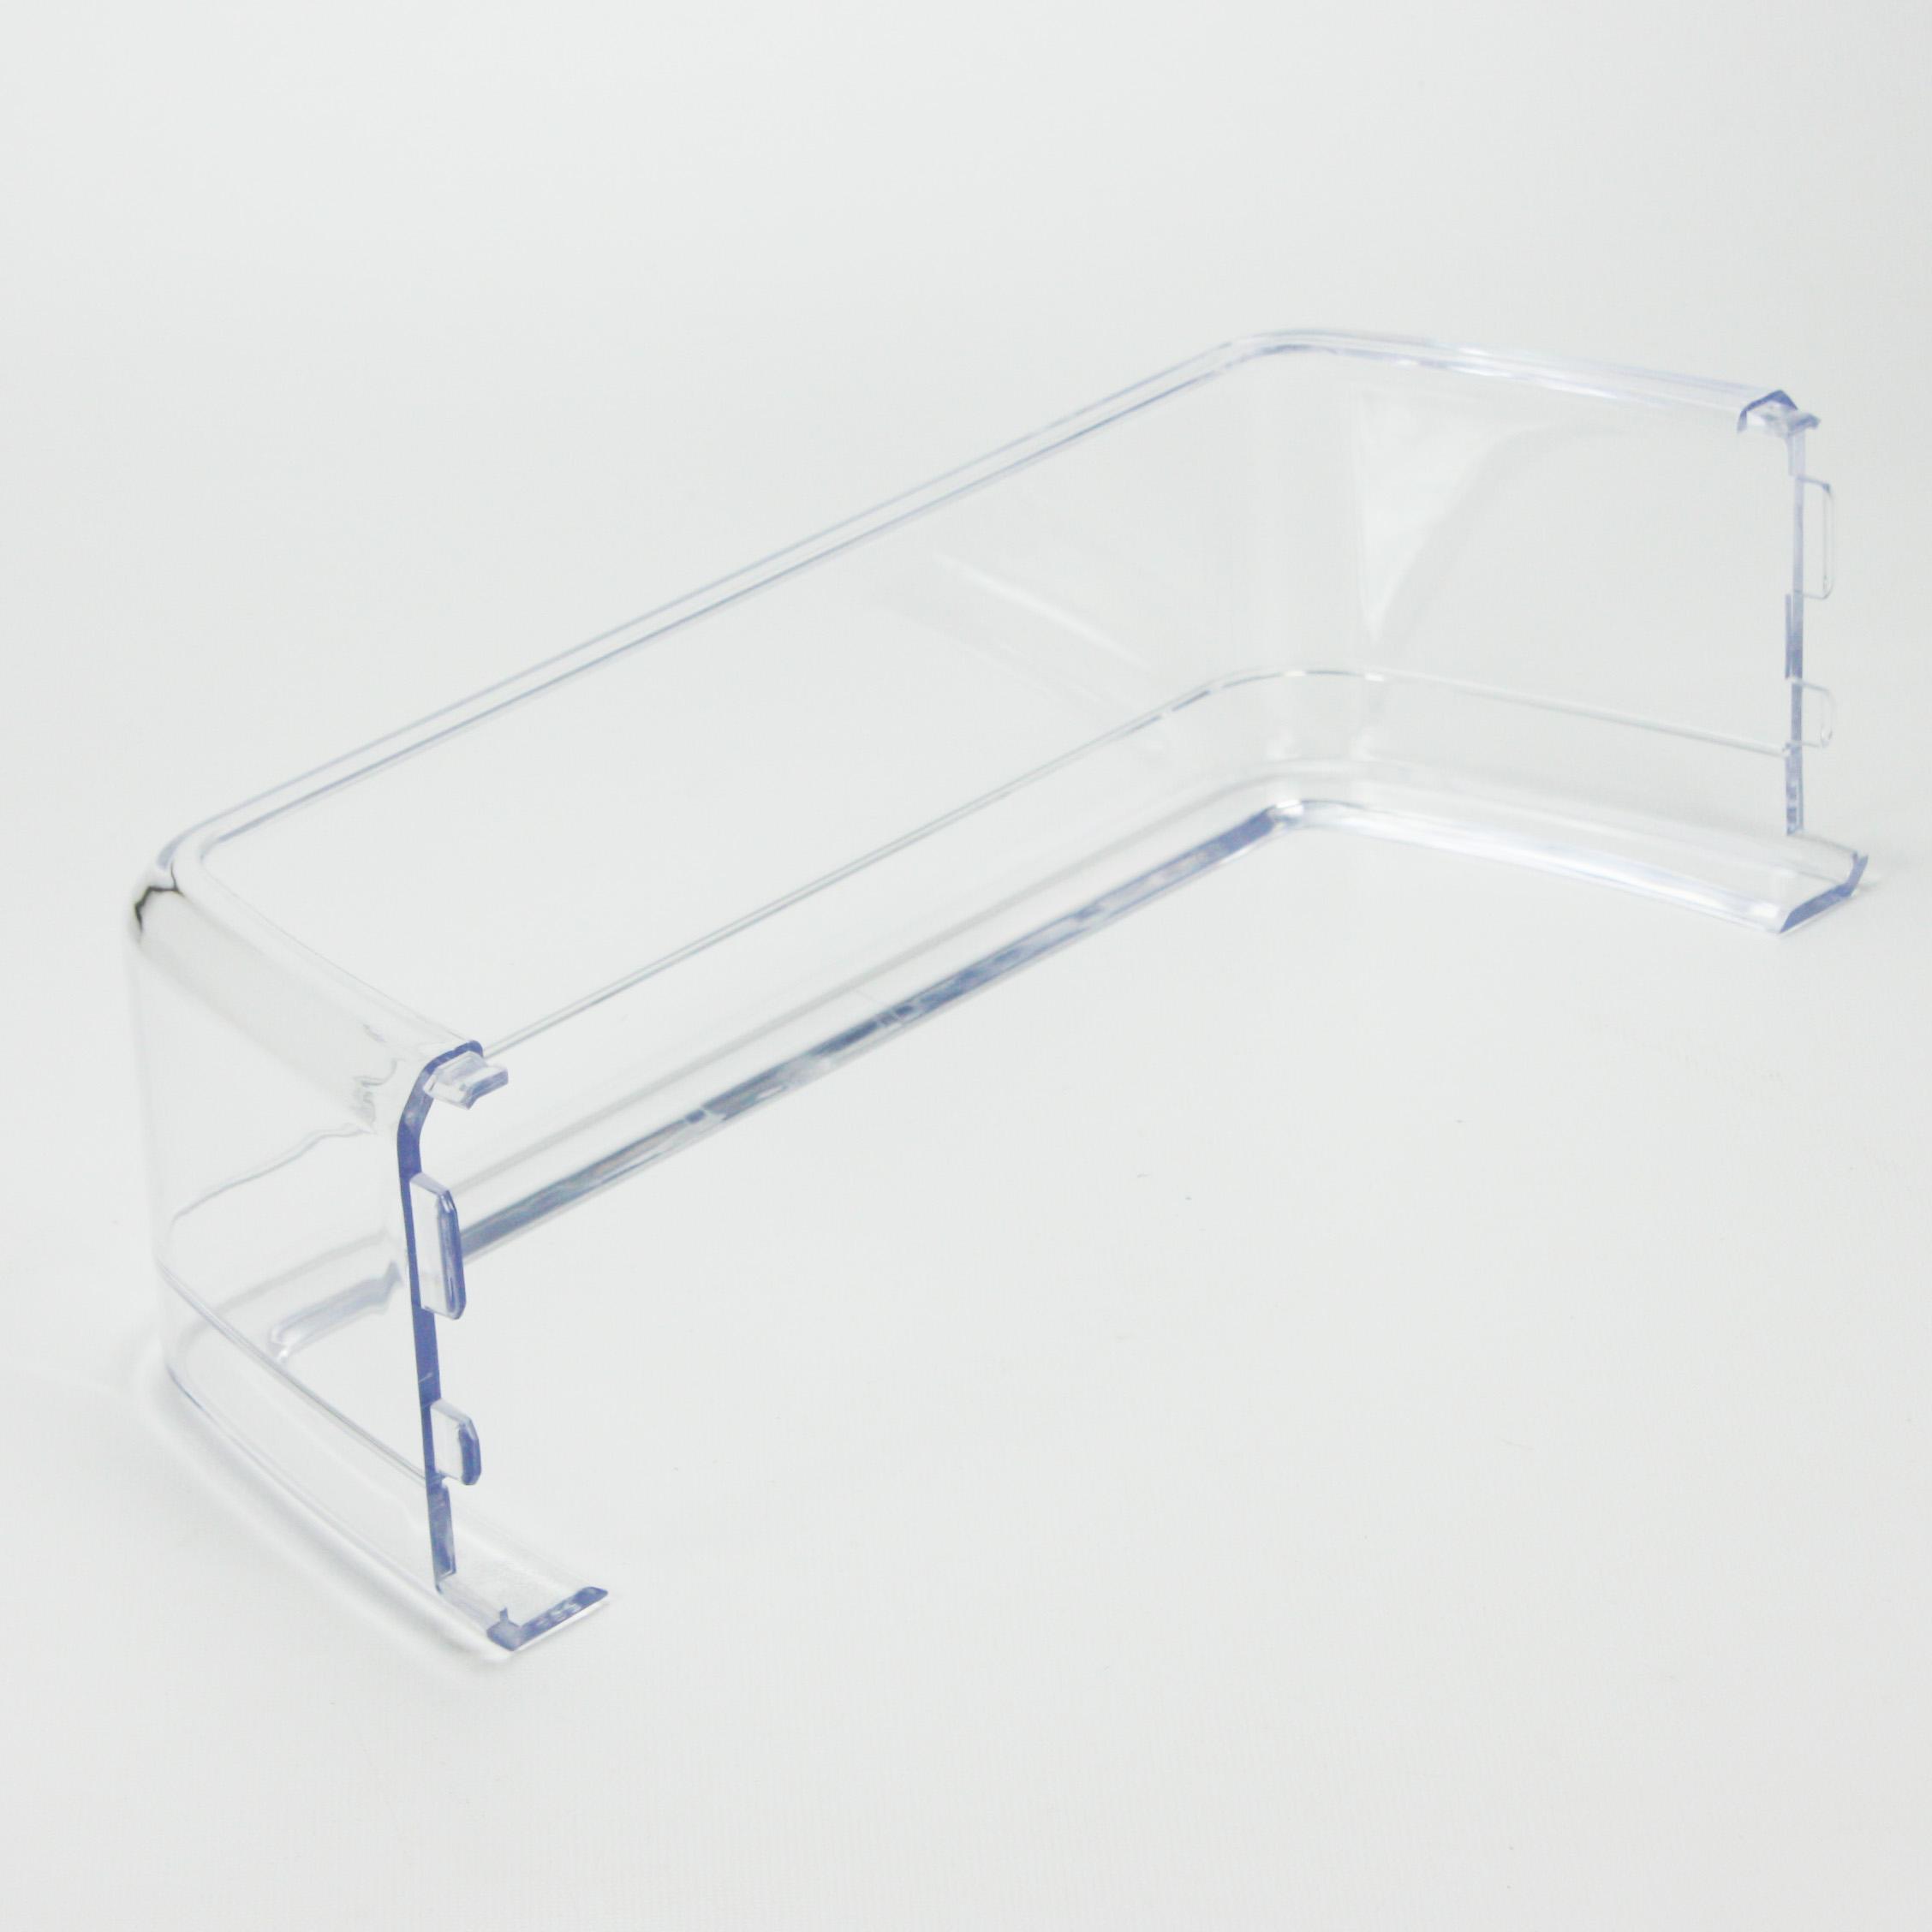 da63 04316b for samsung refrigerator door shelf bar. Black Bedroom Furniture Sets. Home Design Ideas